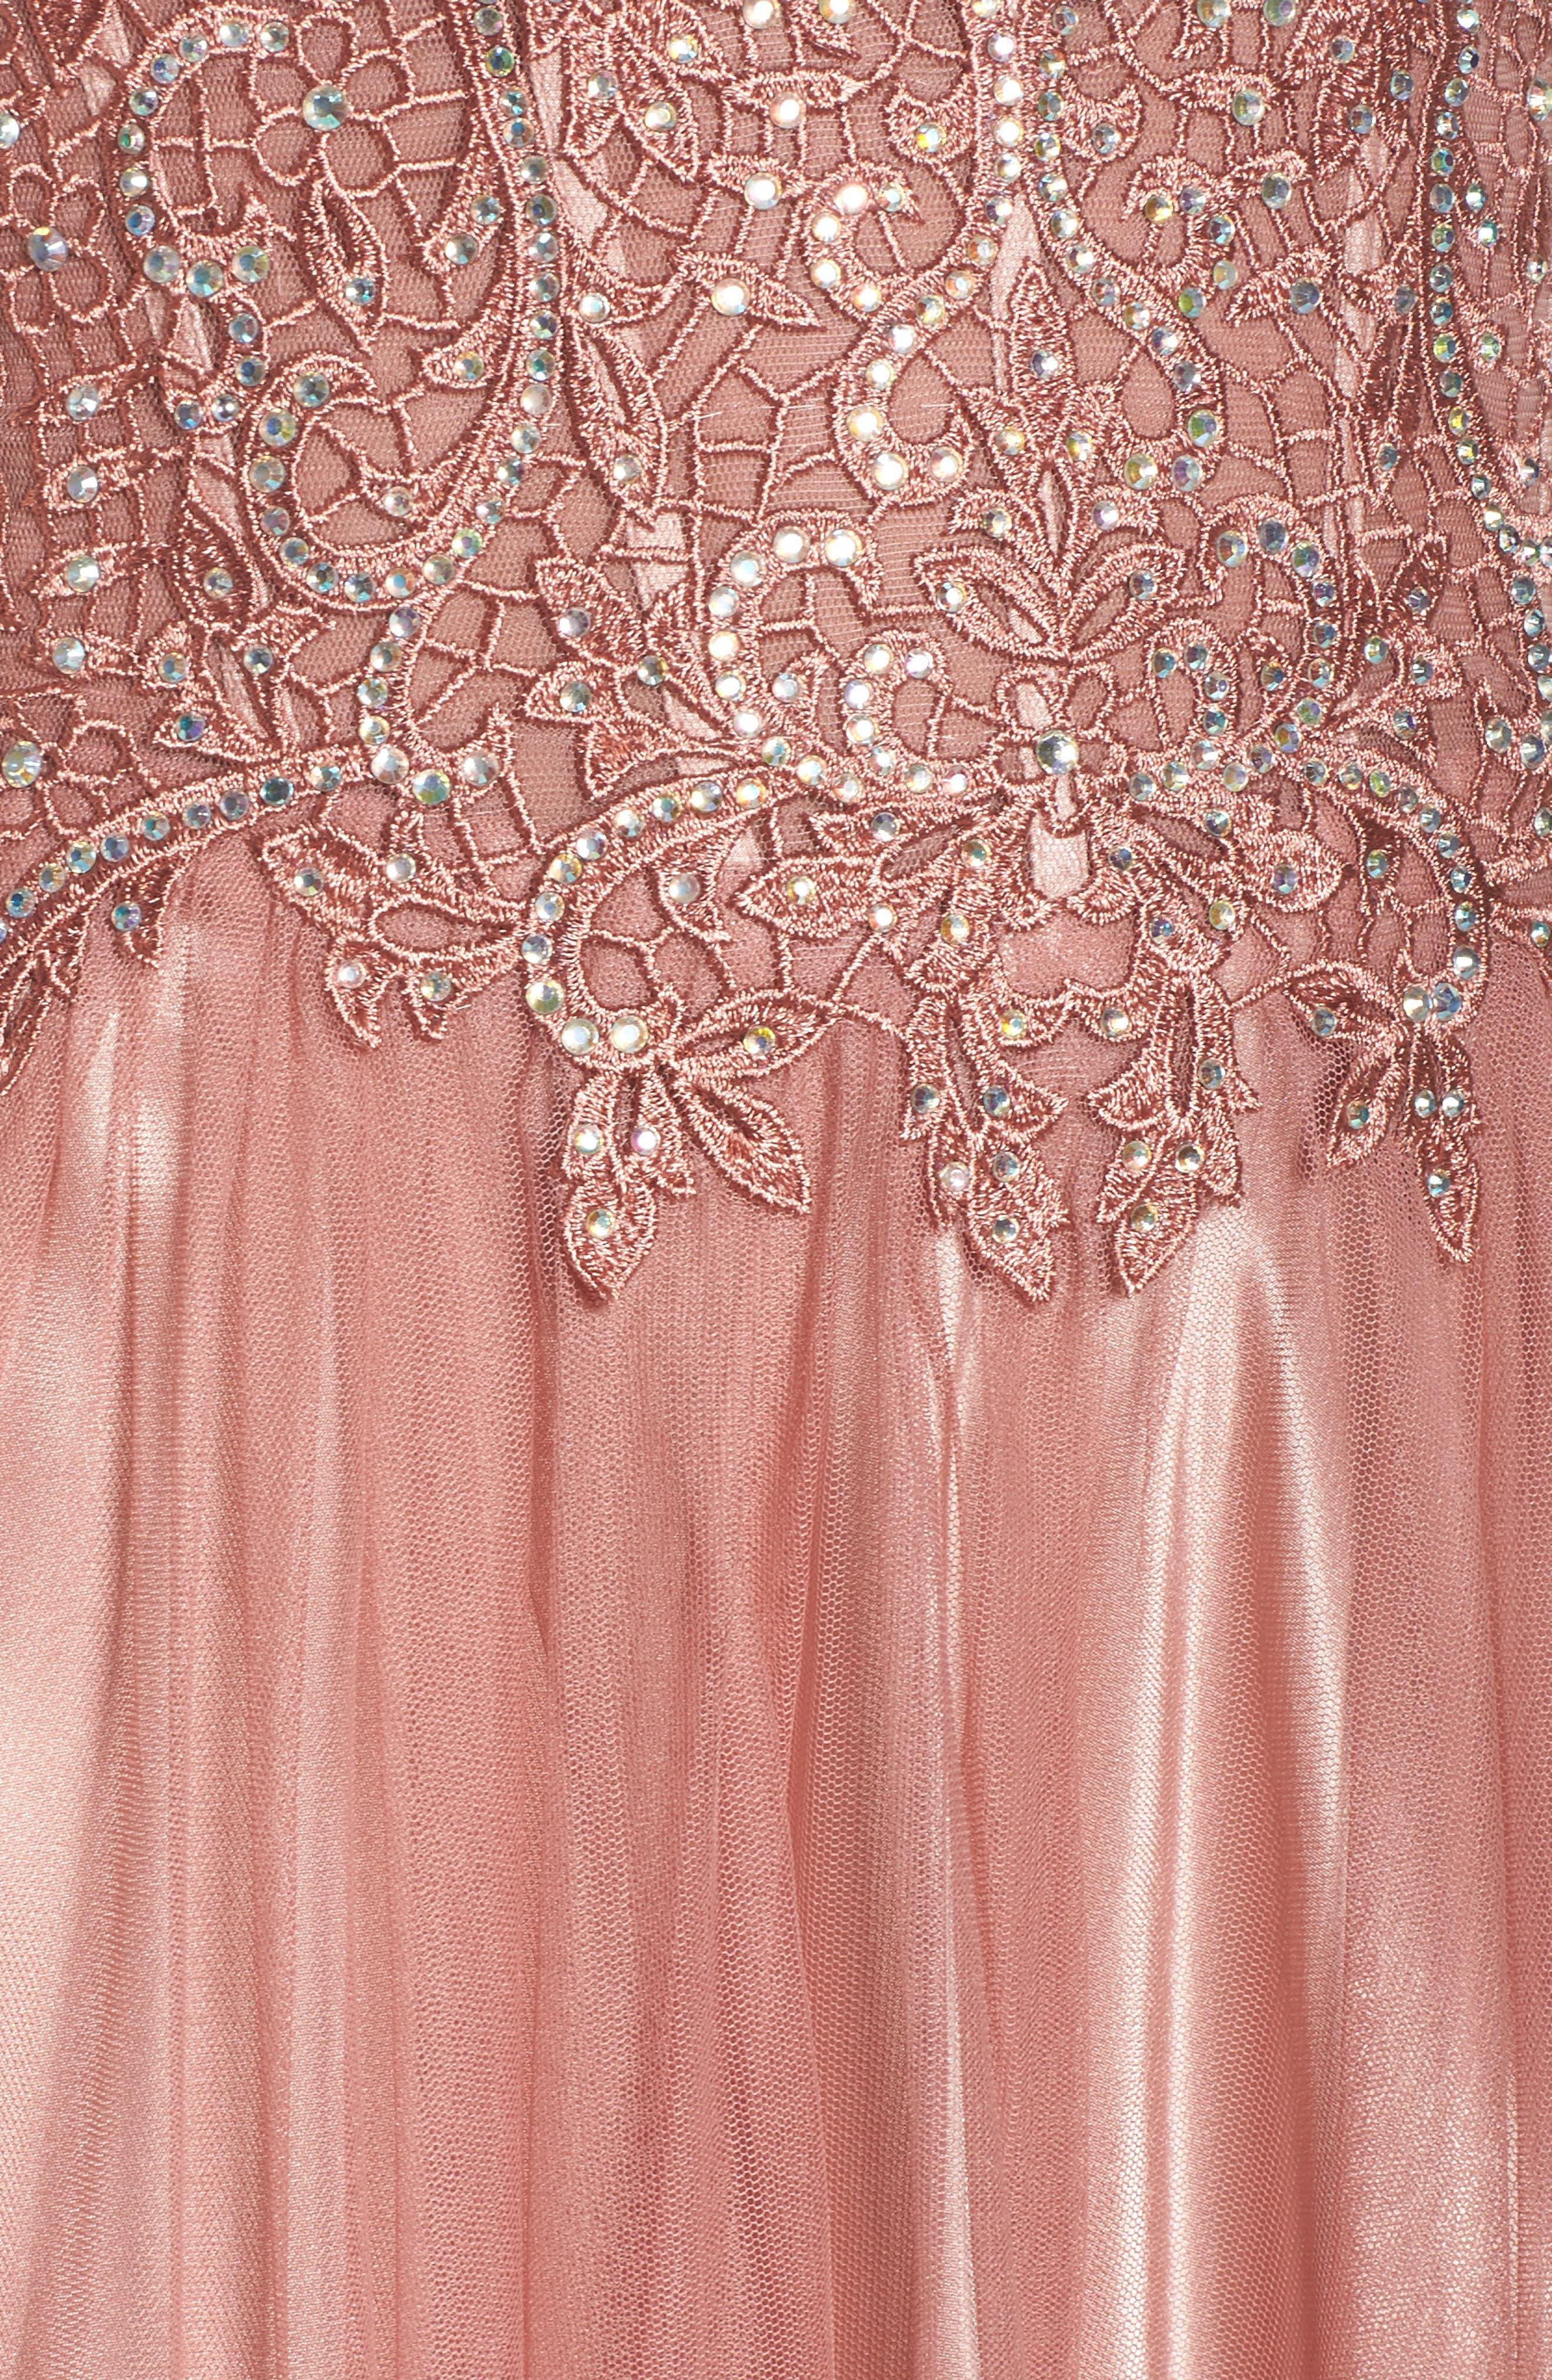 Embellished Corset Ballgown,                             Alternate thumbnail 5, color,                             654